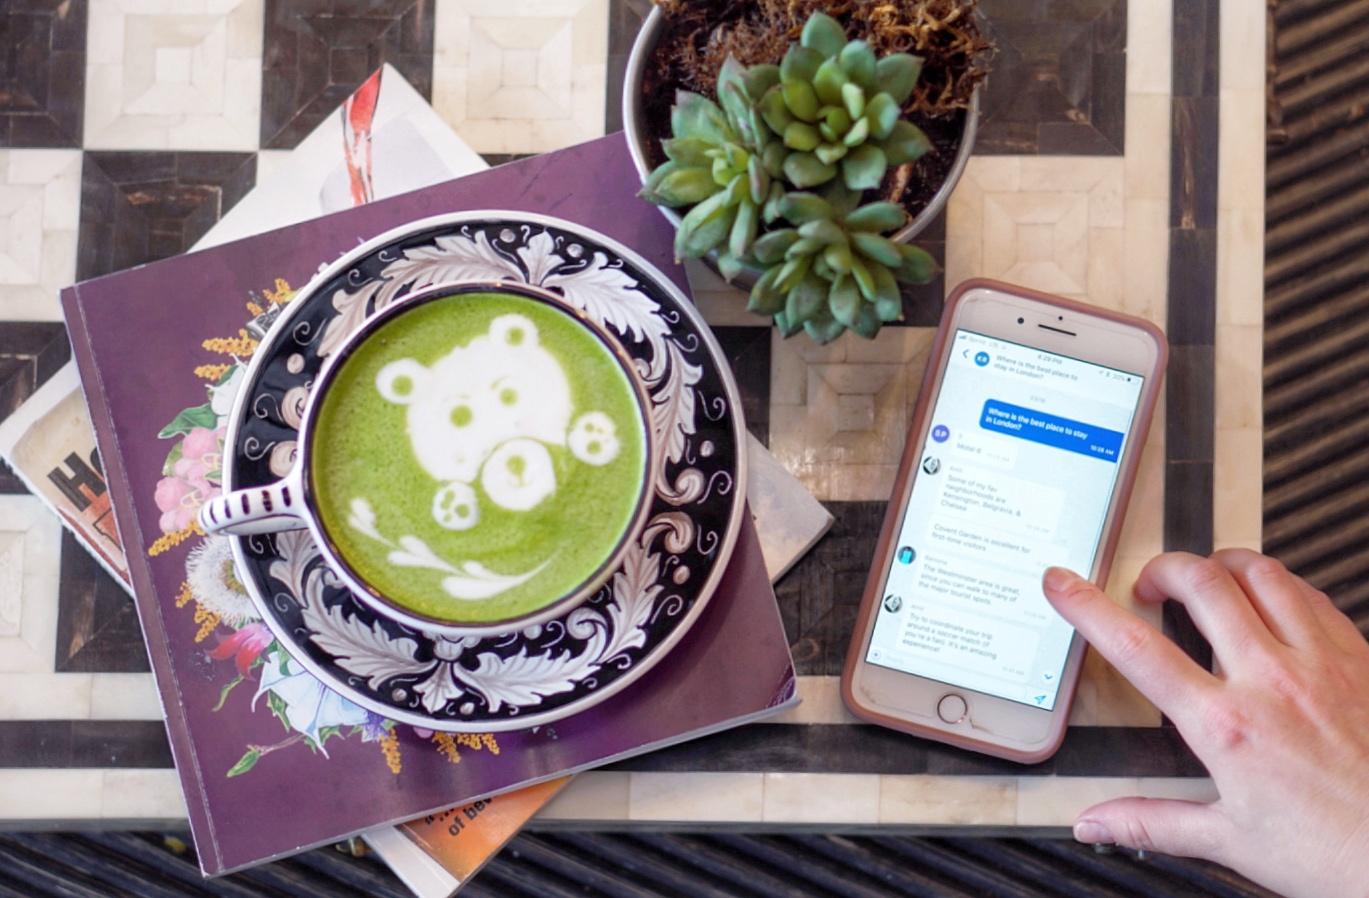 Oros App for Food Recommendations | coupleinthekitchen.com